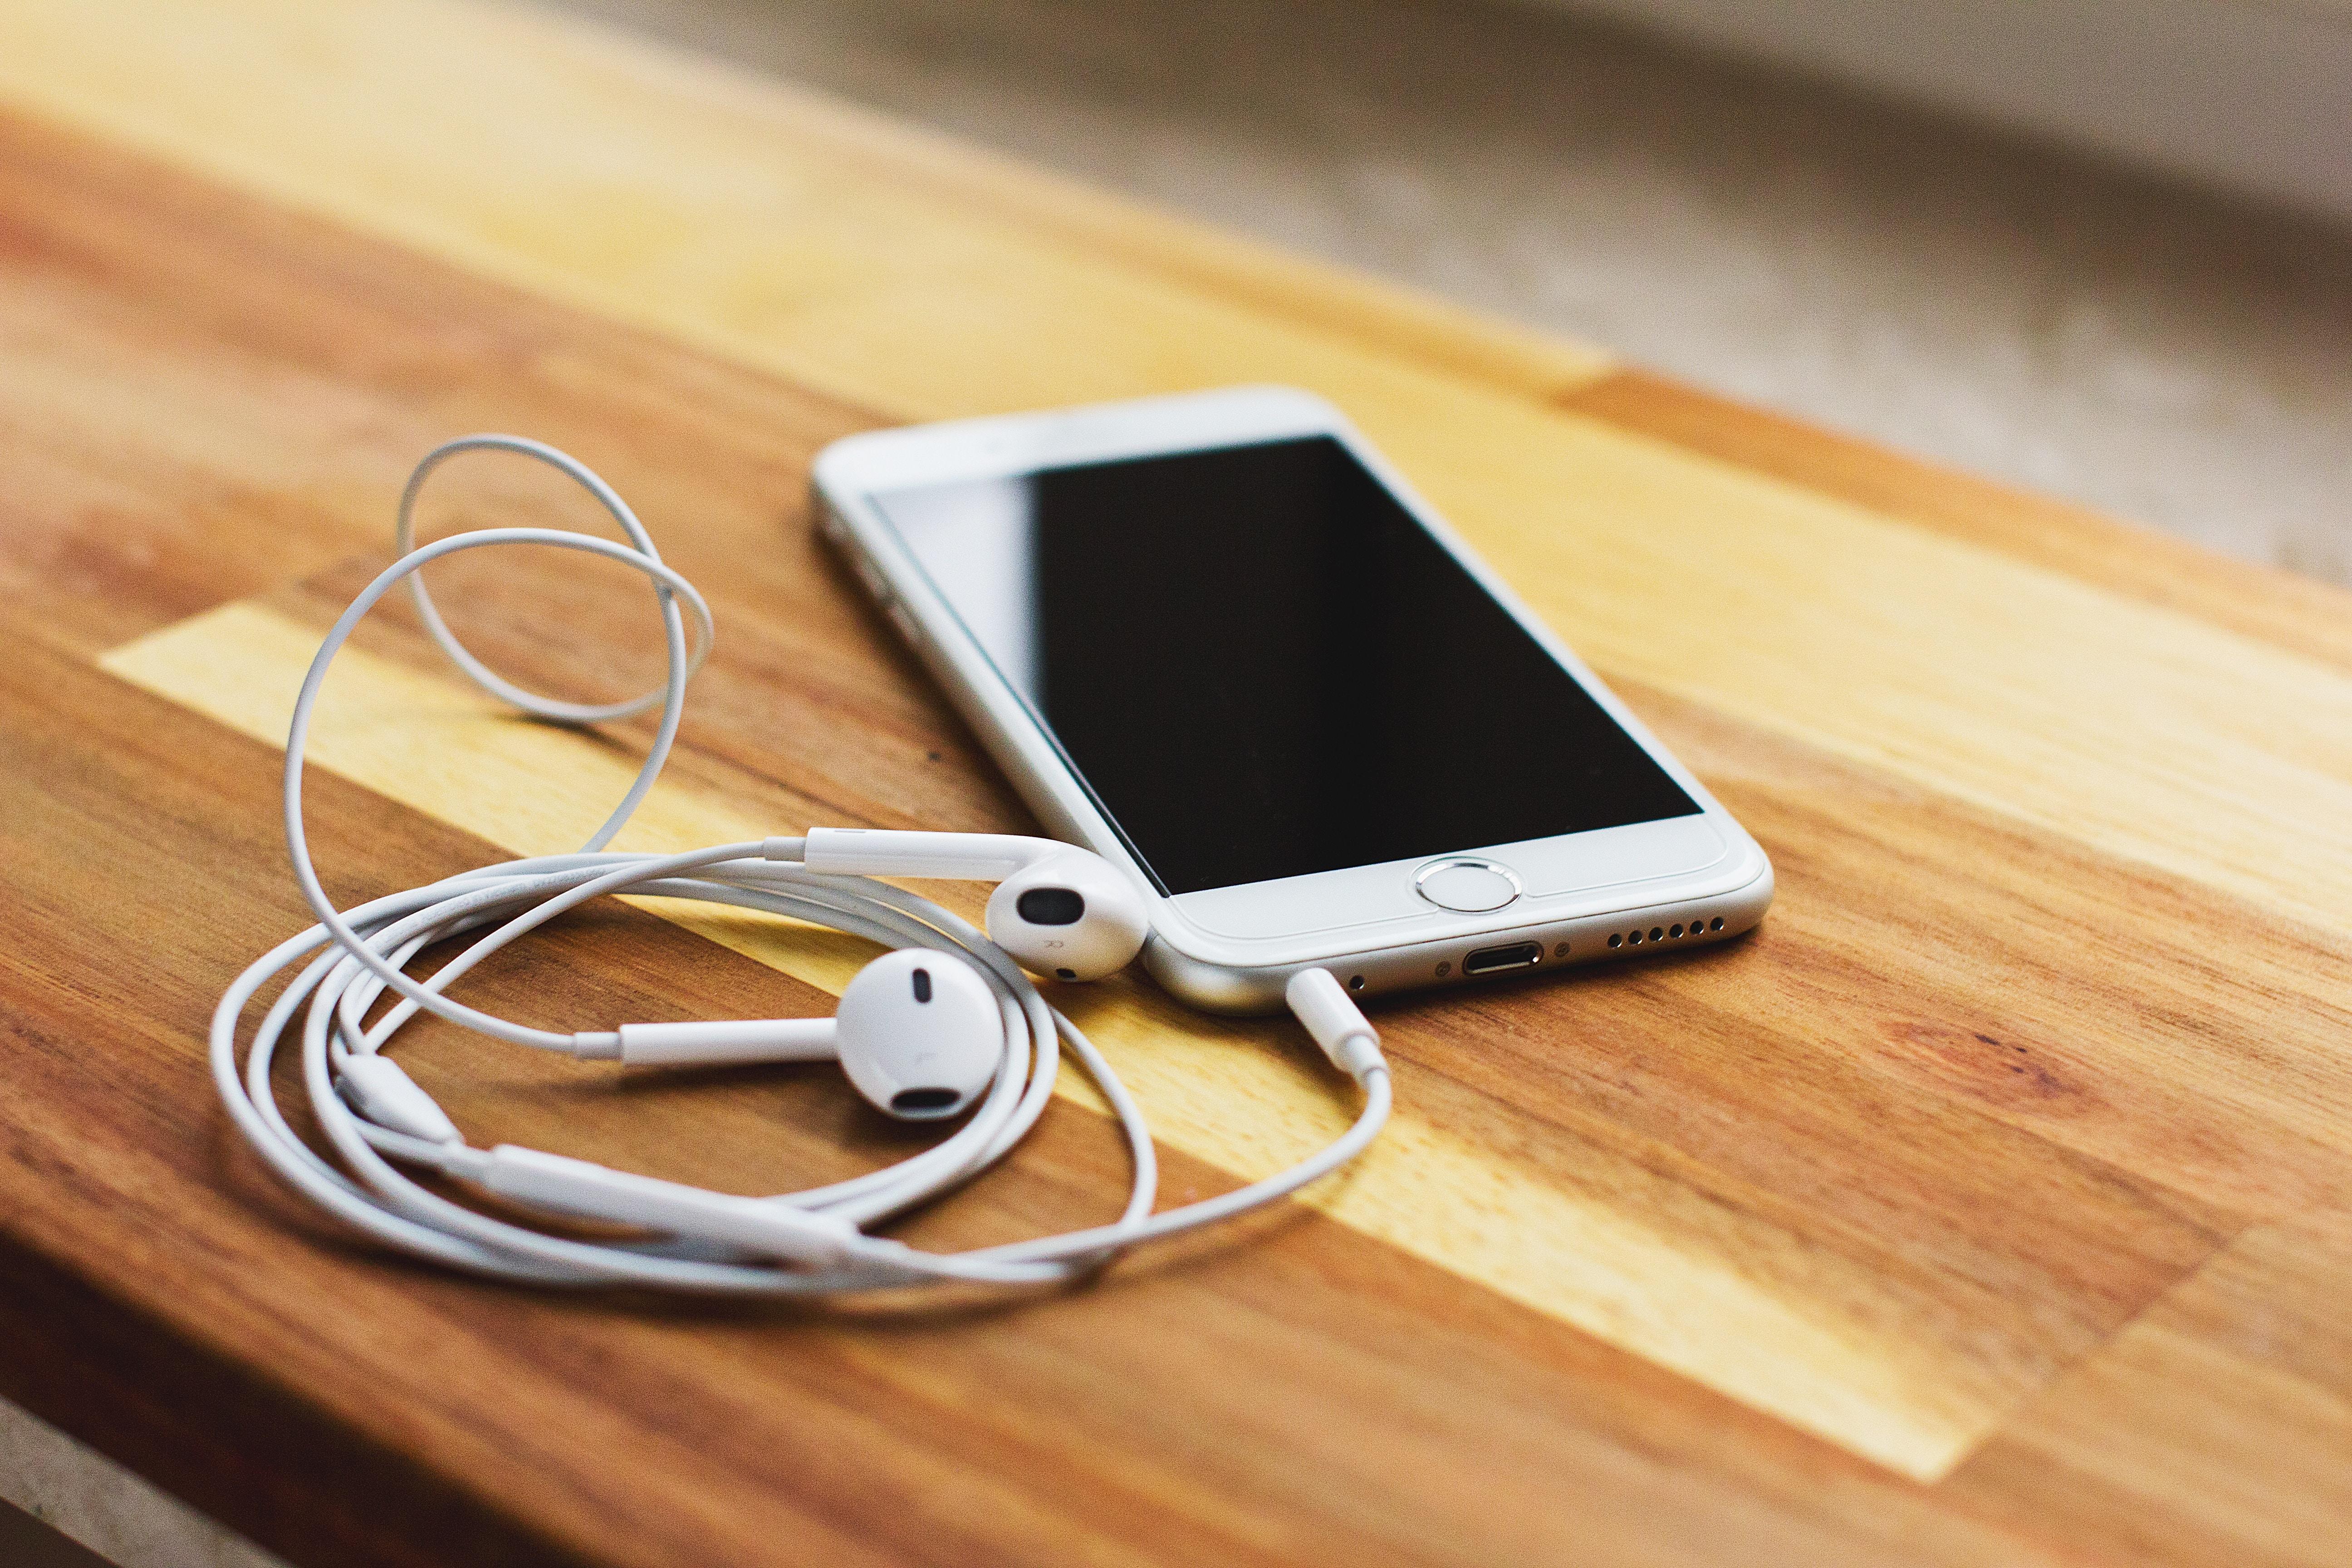 500+ Earphones Pictures  Download Free Images on Unsplash